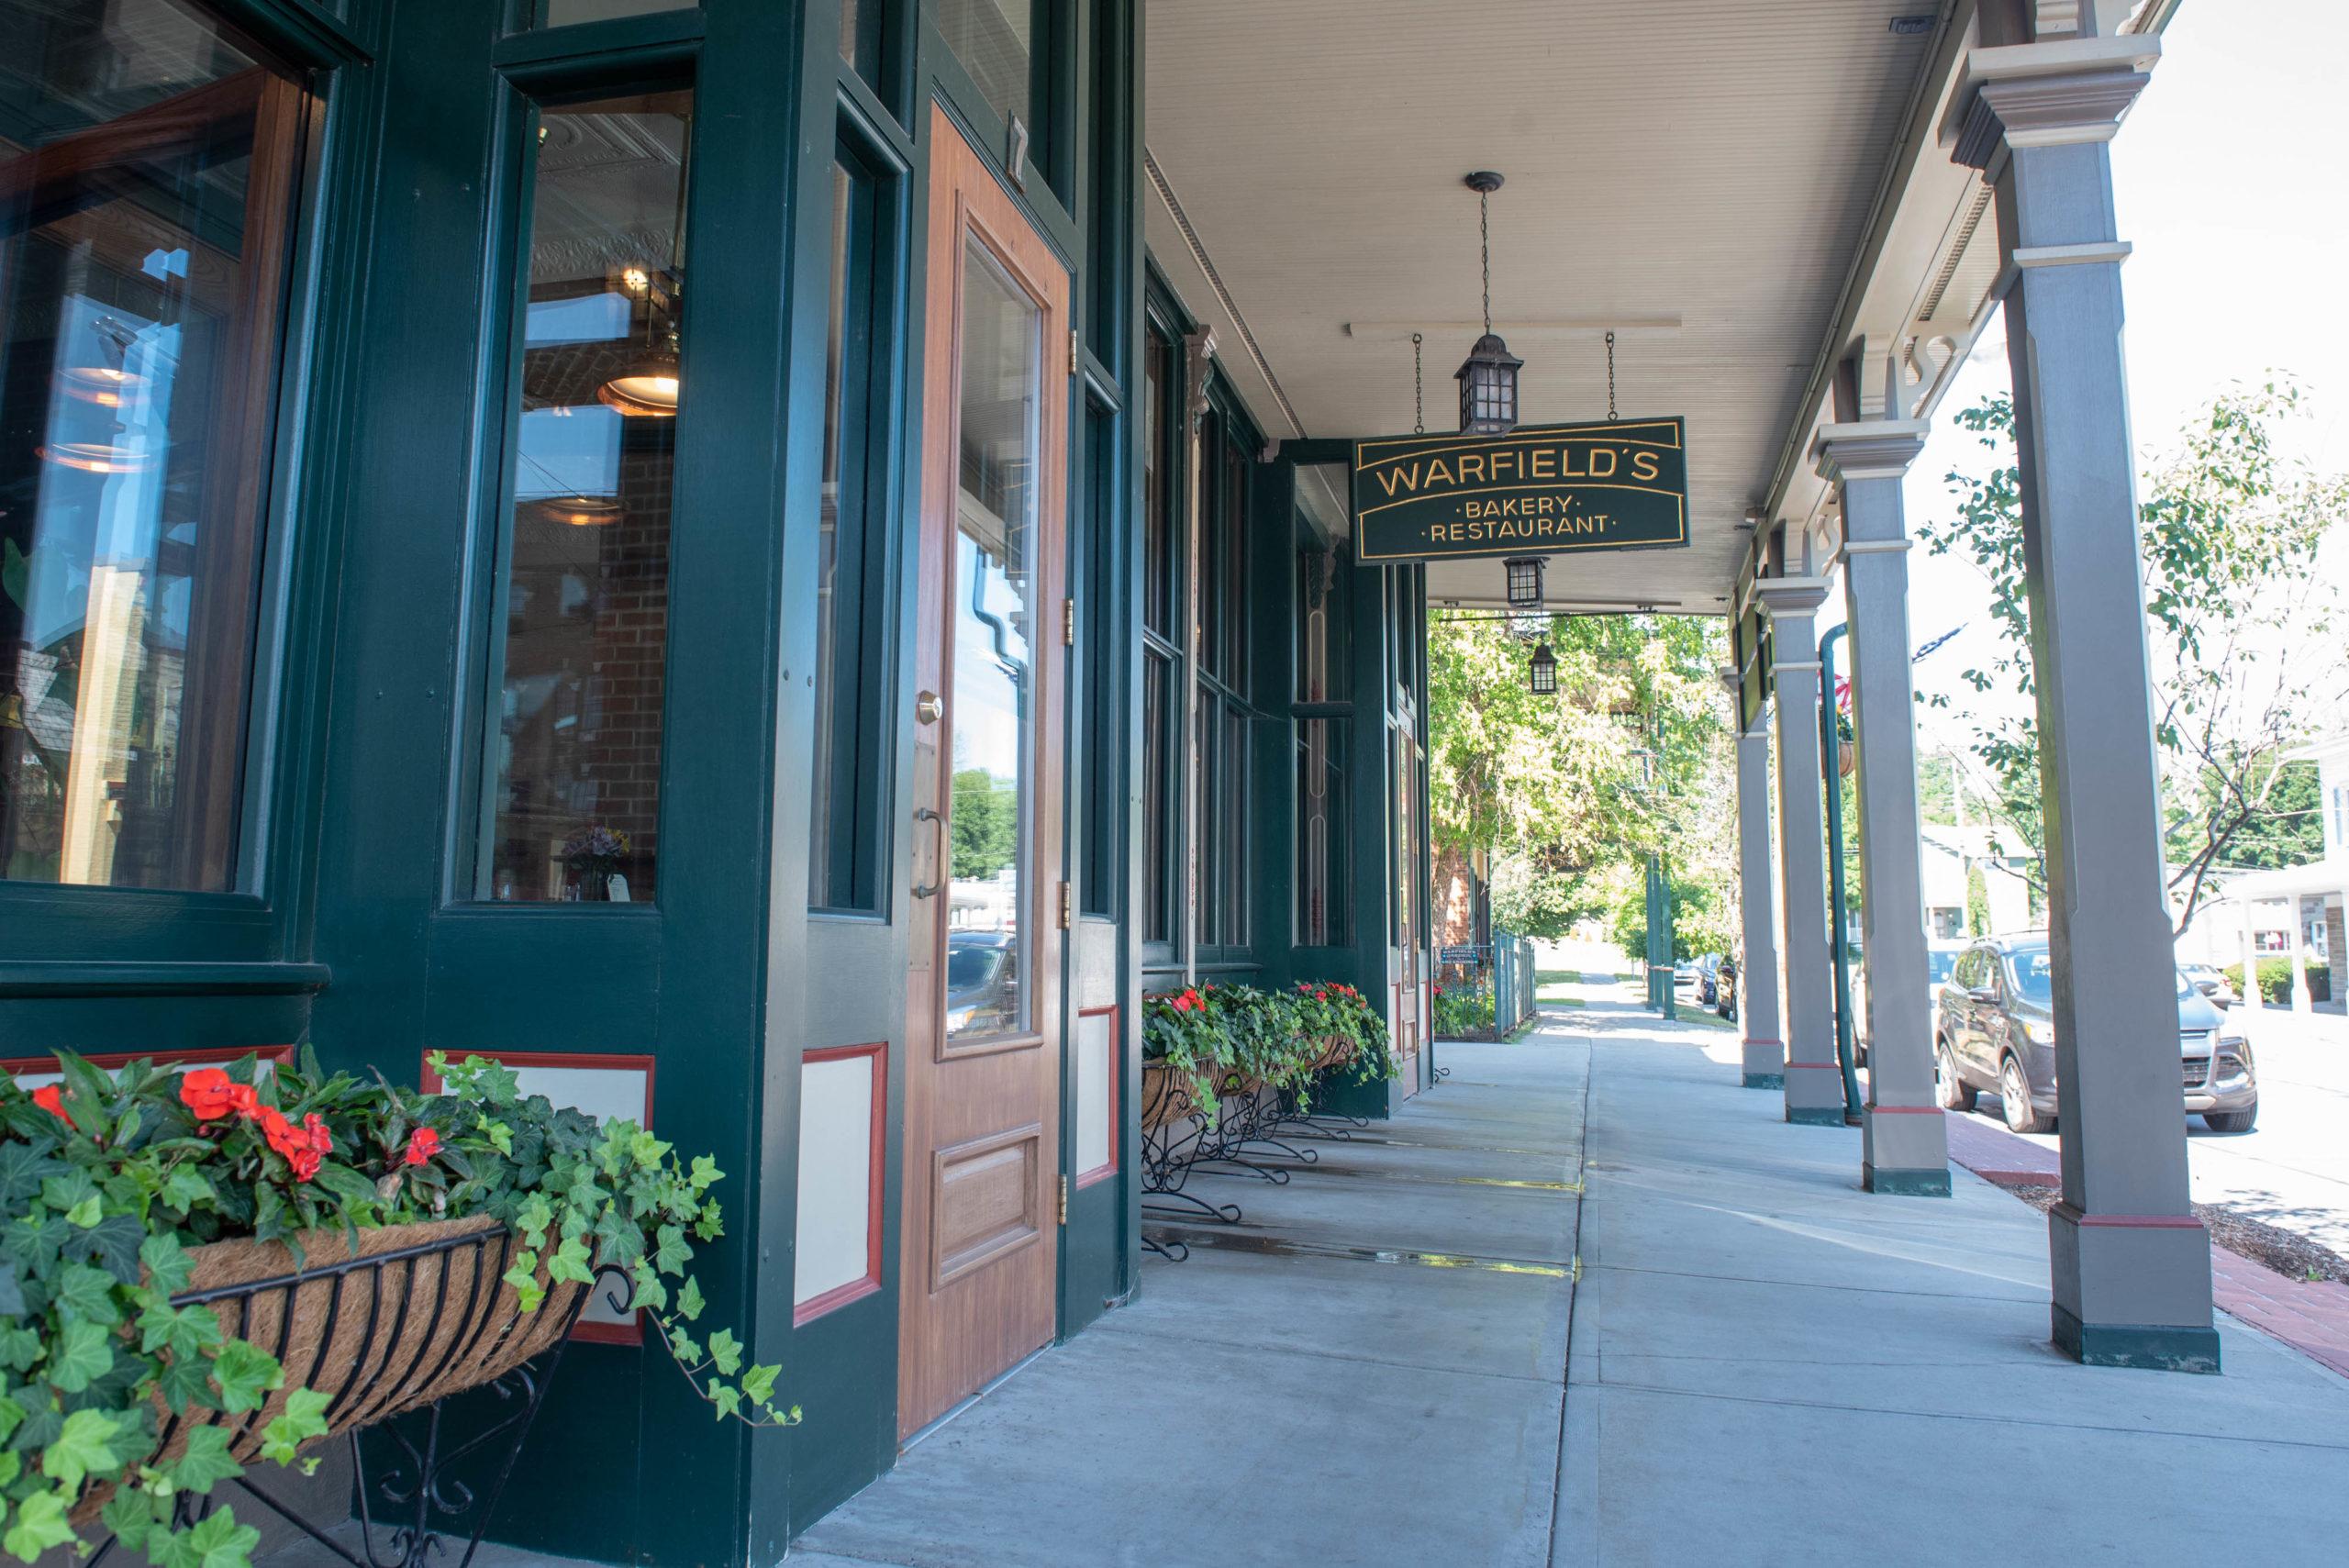 Warfield's Restaurant, Lounge & Bakery